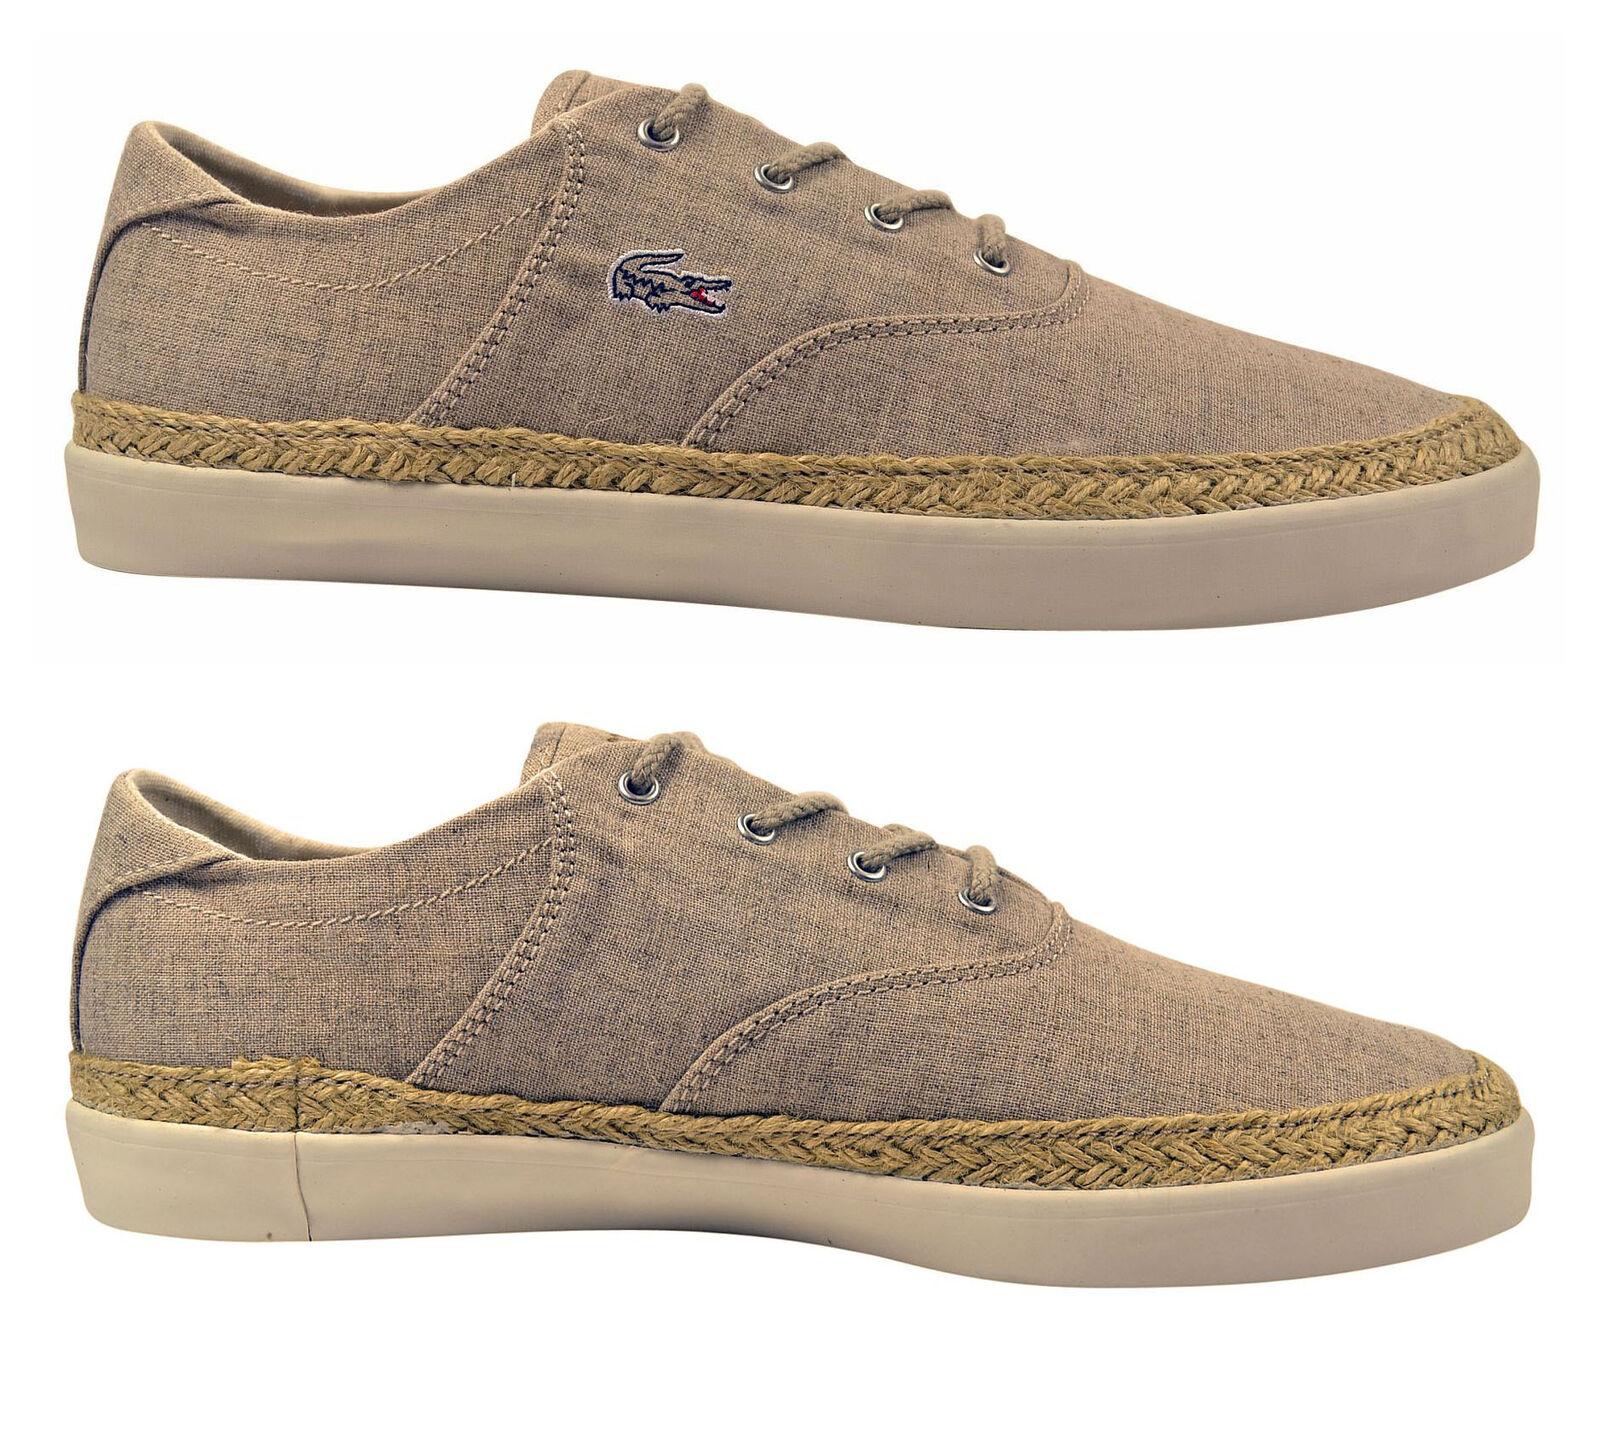 Lacoste Glendon Espa W SRW natural Schuhe Sneaker